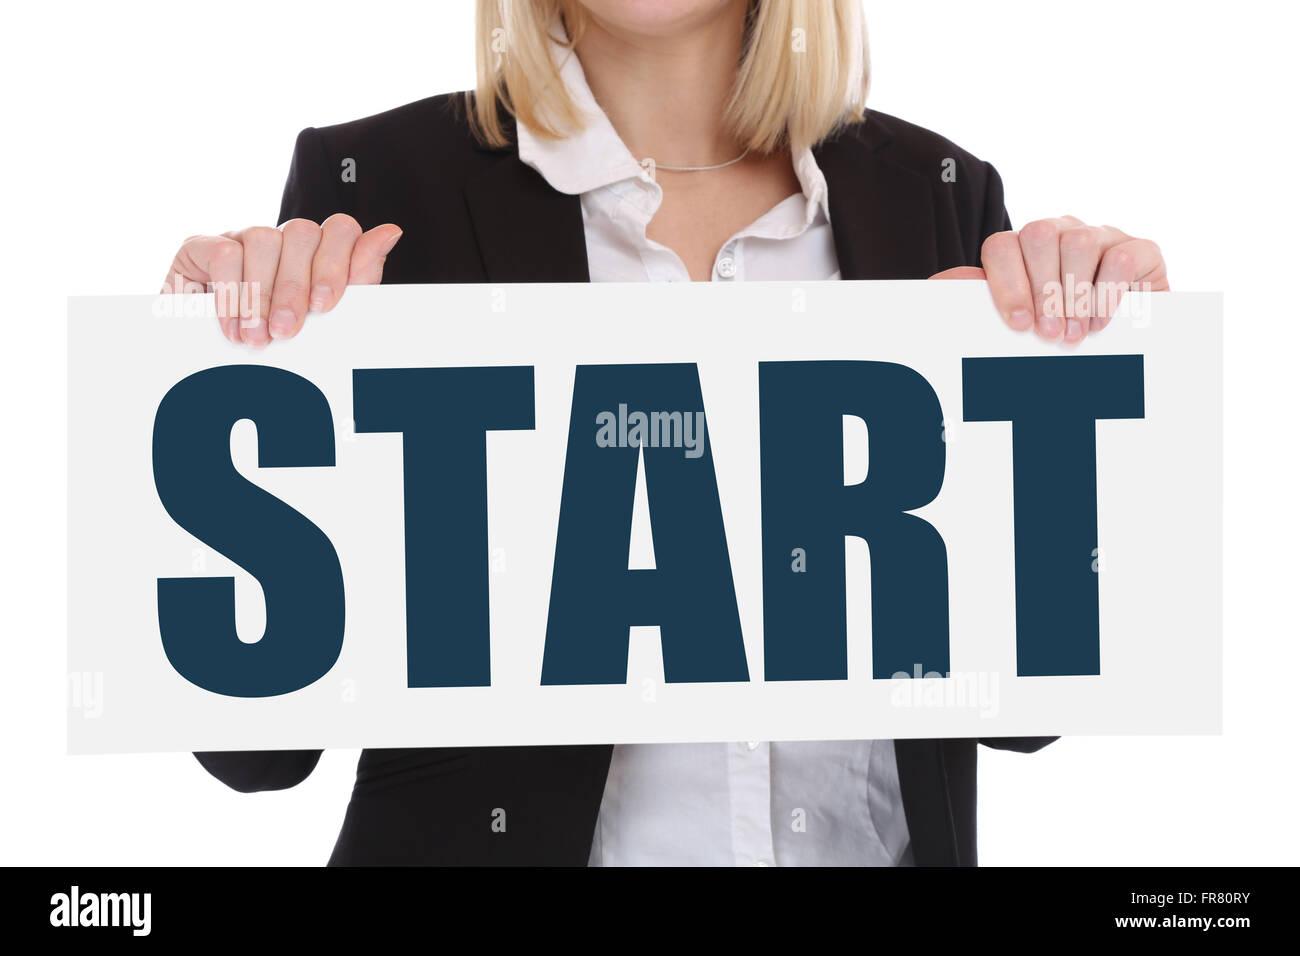 Start starting begin beginning business concept career goals motivation vision - Stock Image